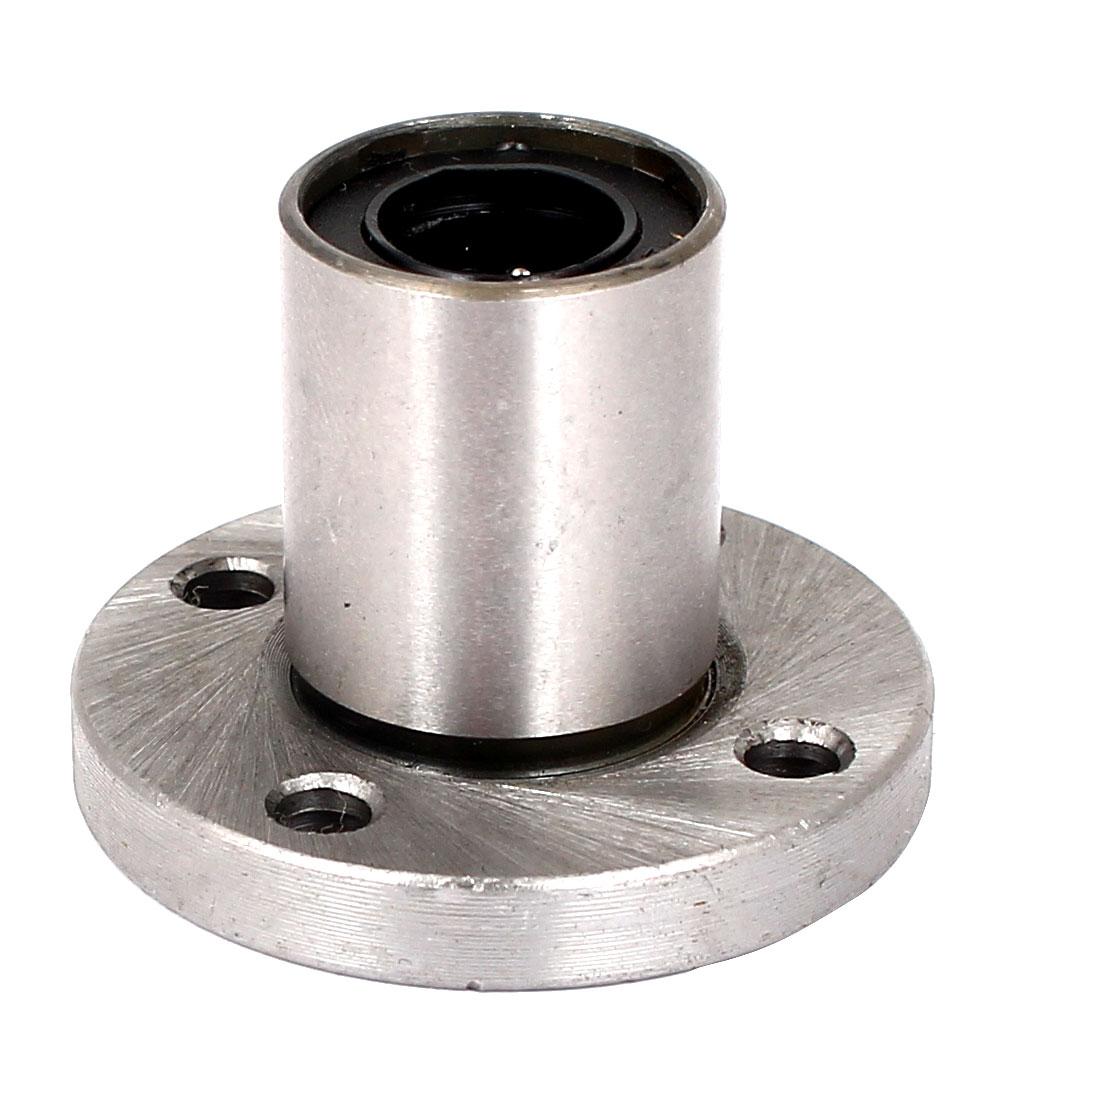 LMF12UU 42mm Round Flange Linear Bearing Ball Bushing 12mmx21x30mm CNC Parts